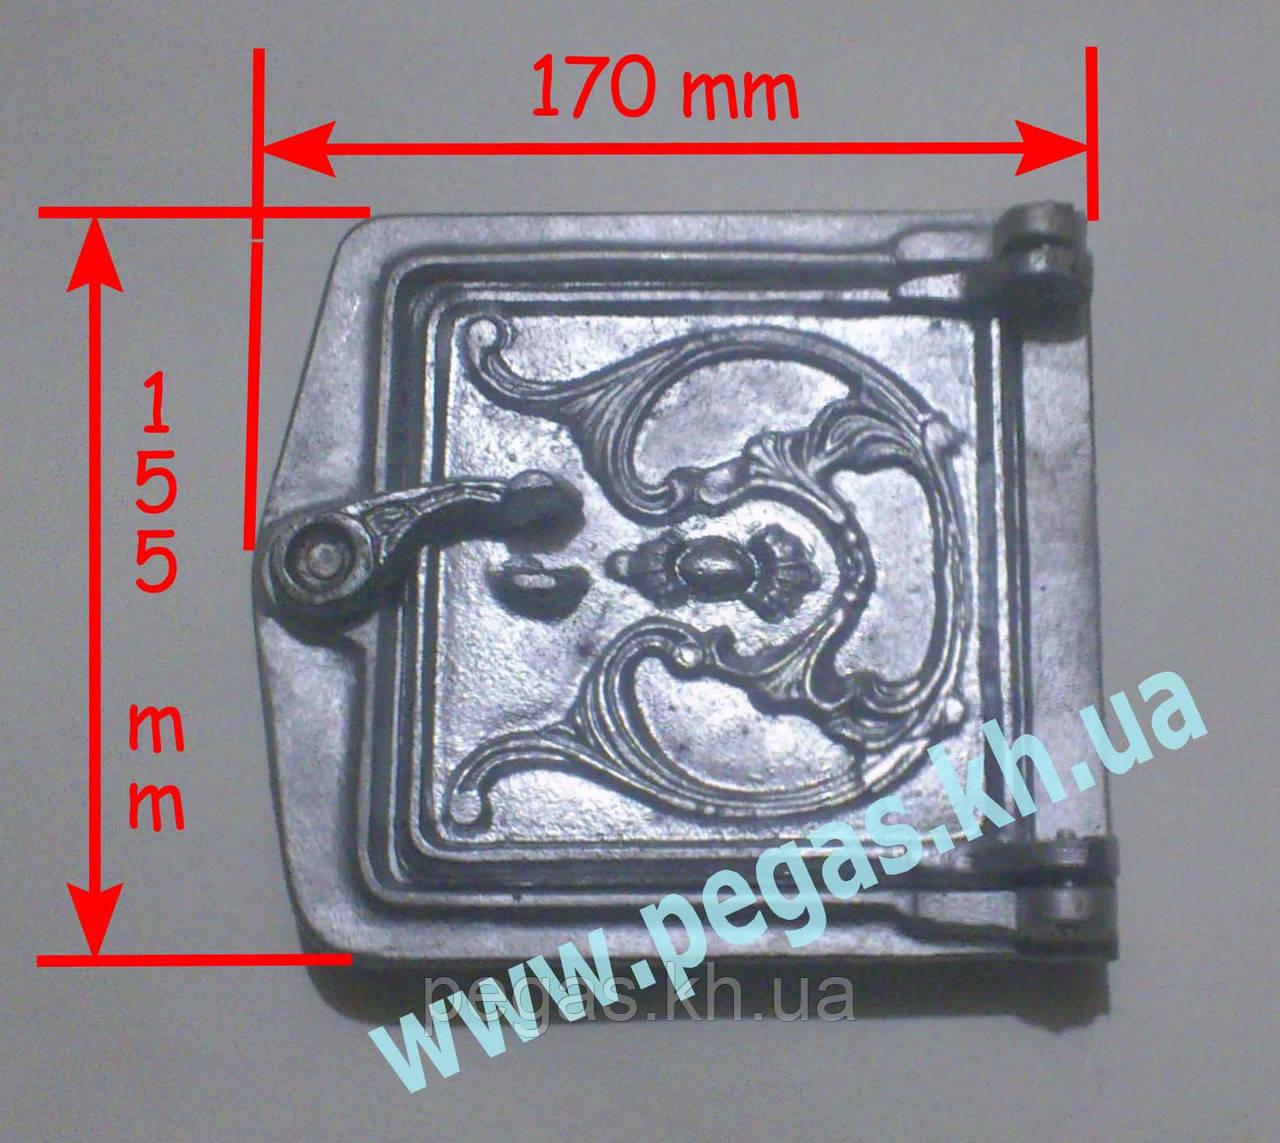 Дверка сажетруска алюминиевая (120х120 мм) печи, грубу, мангал